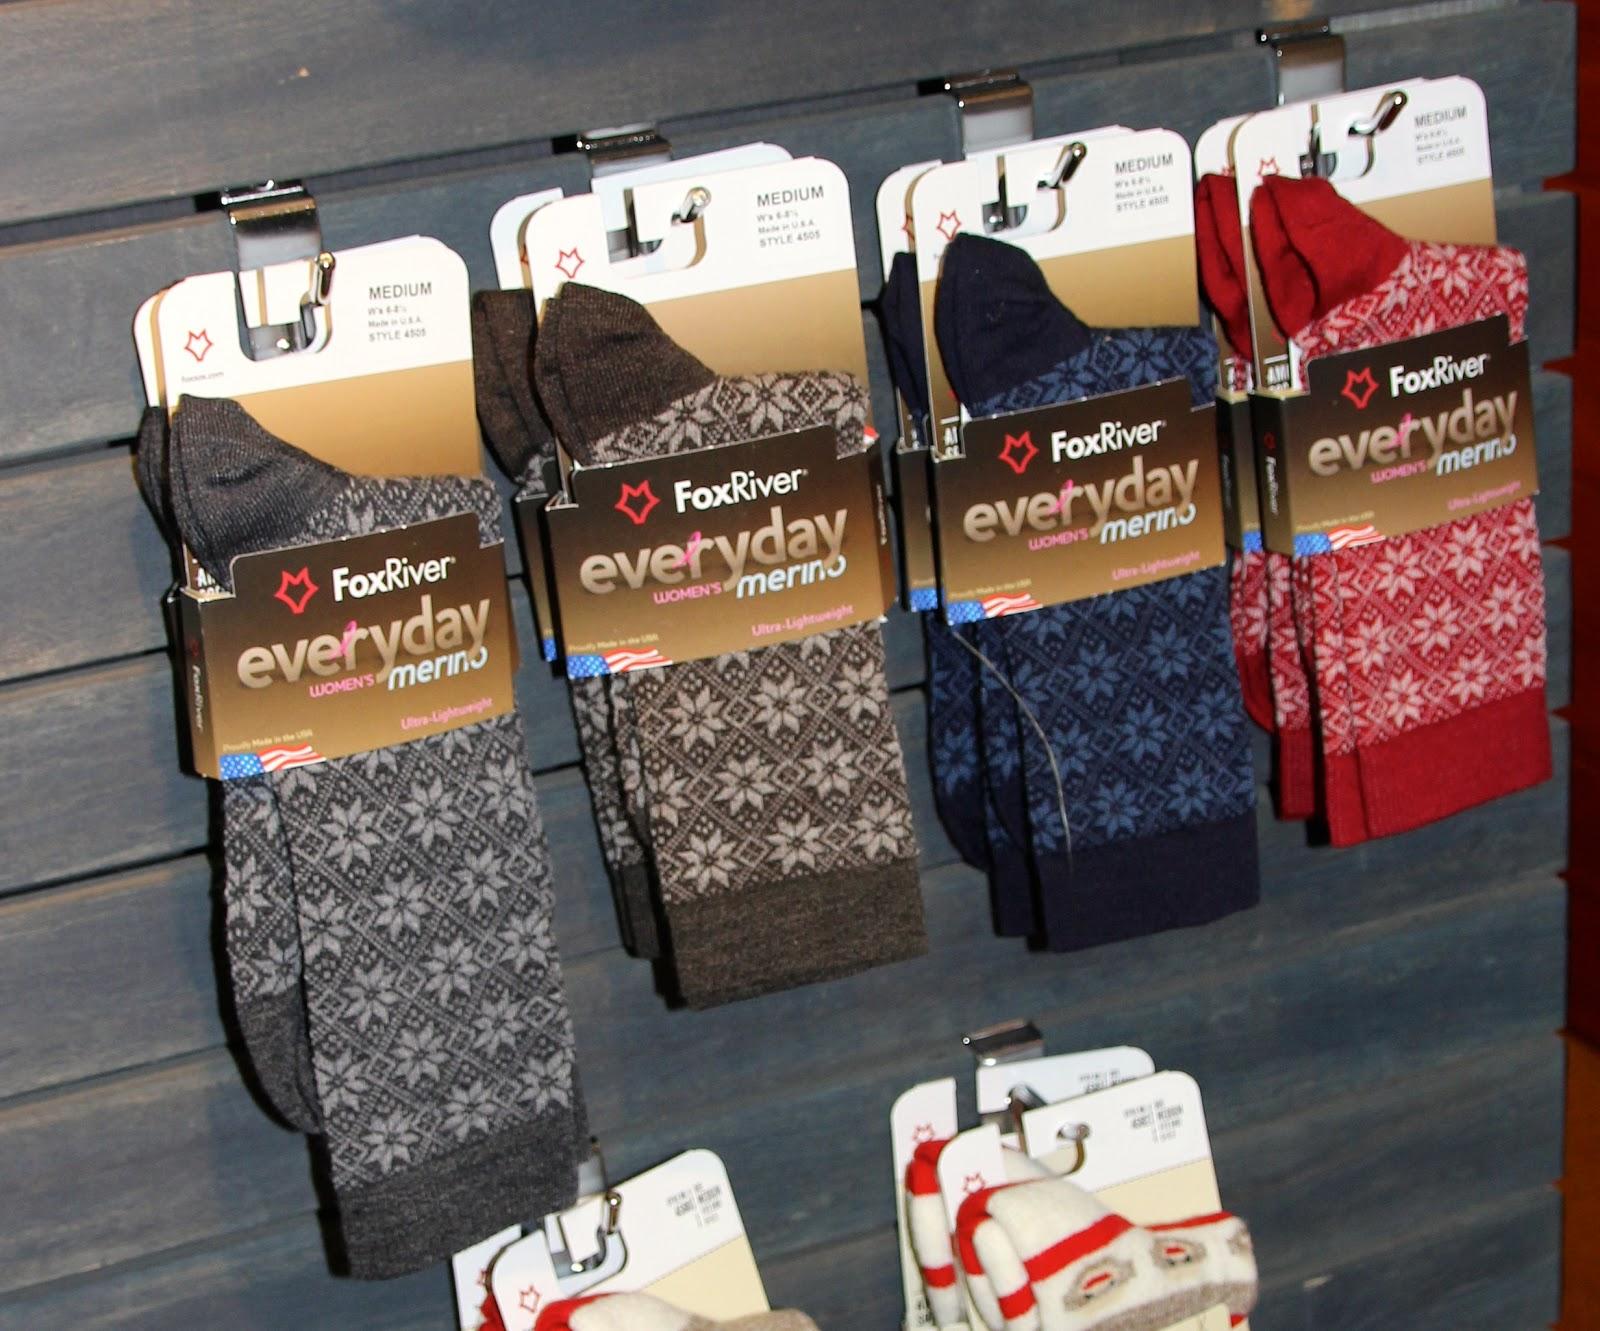 sockwell compression socks washing instructions